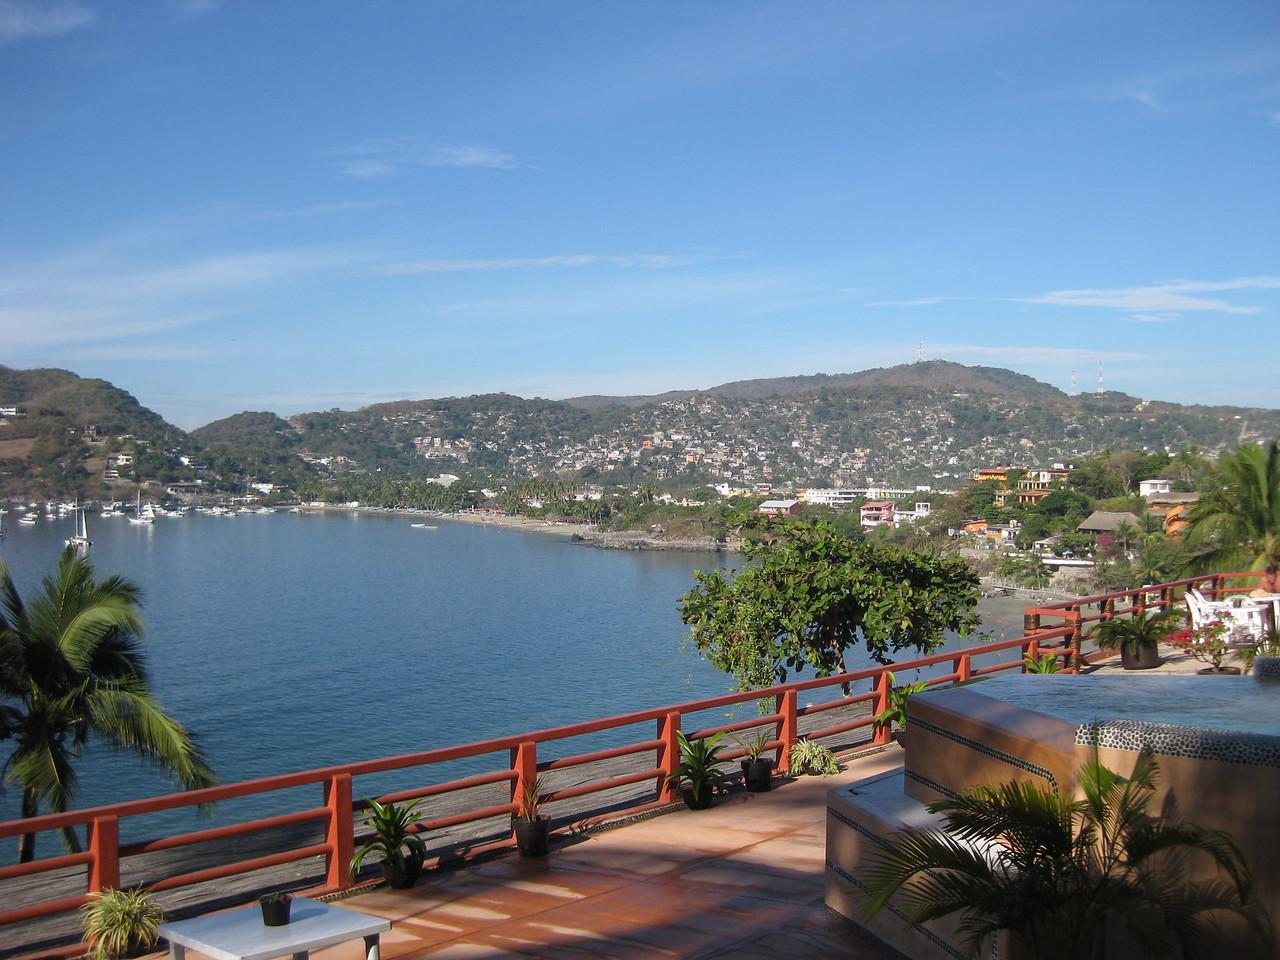 Zihua bay from Hotel Irma deck